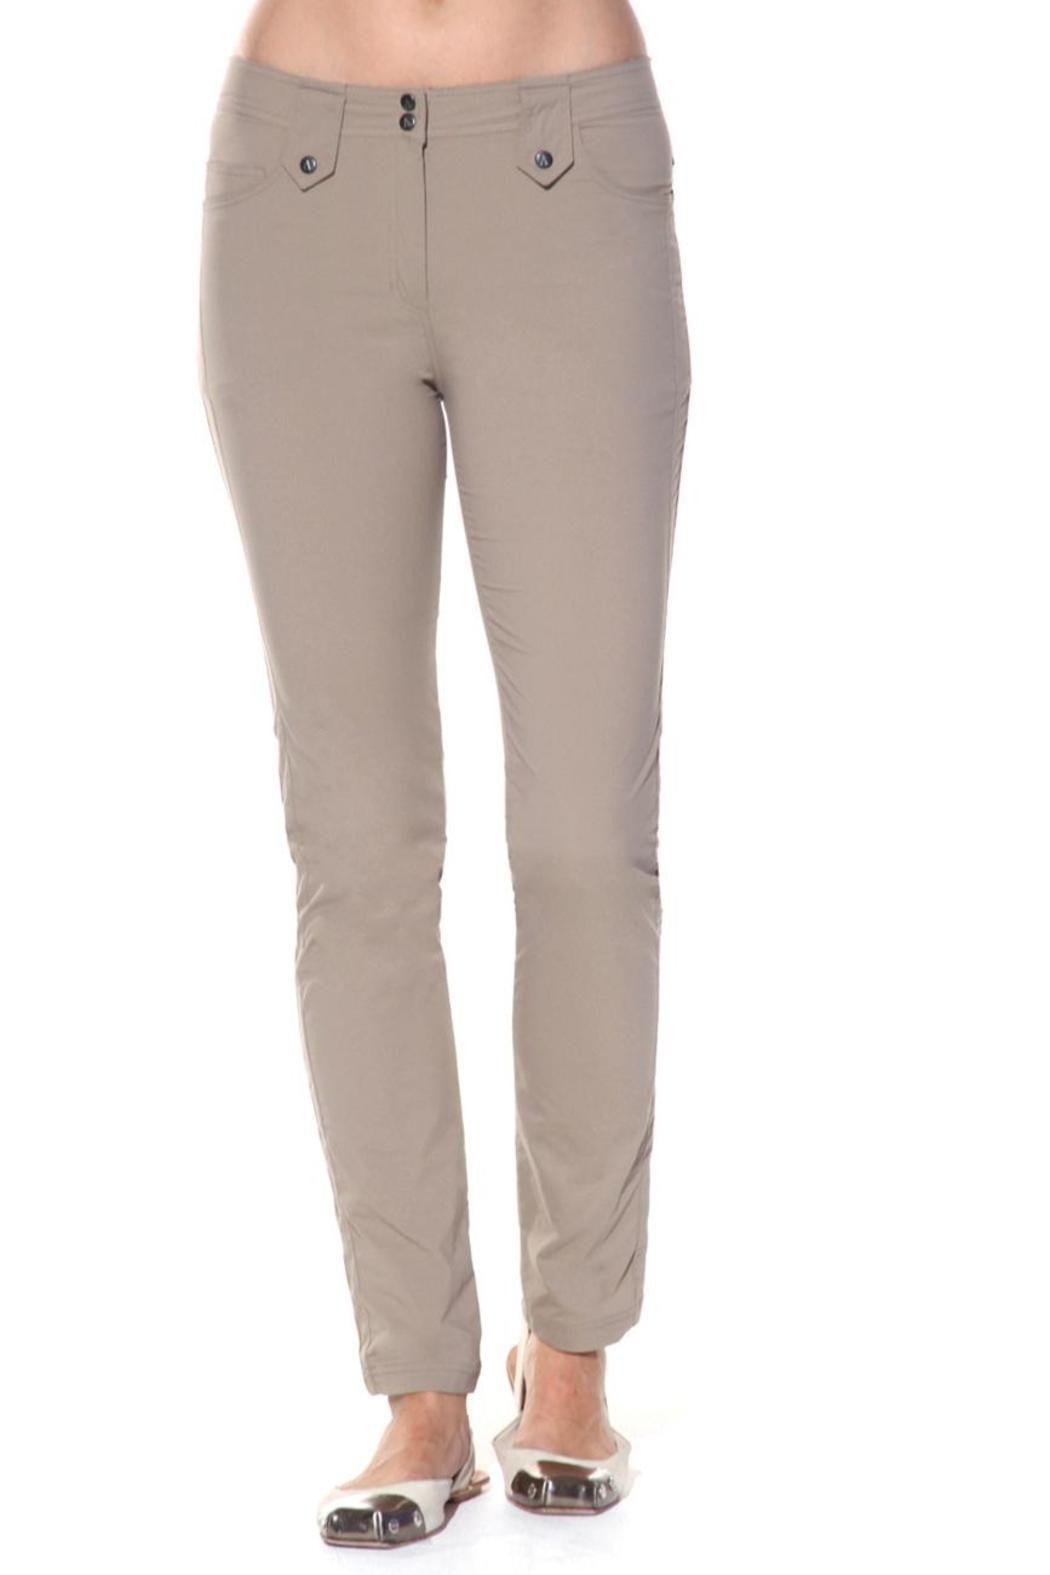 Anatomie Skylar Skinny Pant | Slim legs, Yoga pants and Contours